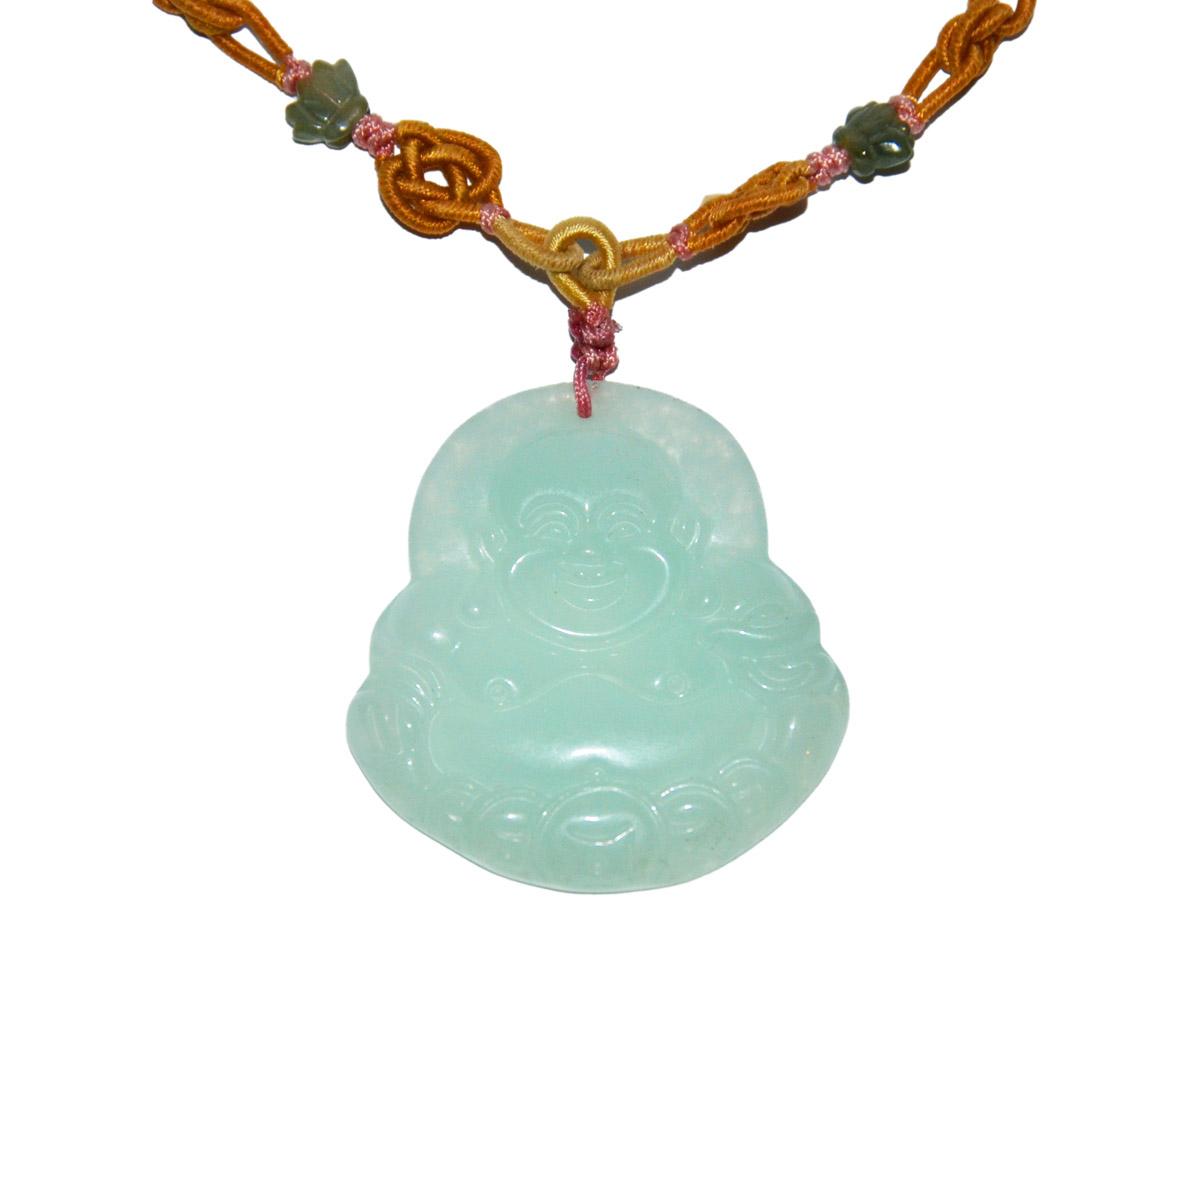 Lot 5 - 玻璃種翡翠雕彌佛掛飾連項錬 Glass Jadeite Pendant Carved with Maitreya Height: 2 in (5.1 cm)  Weight: 25 g